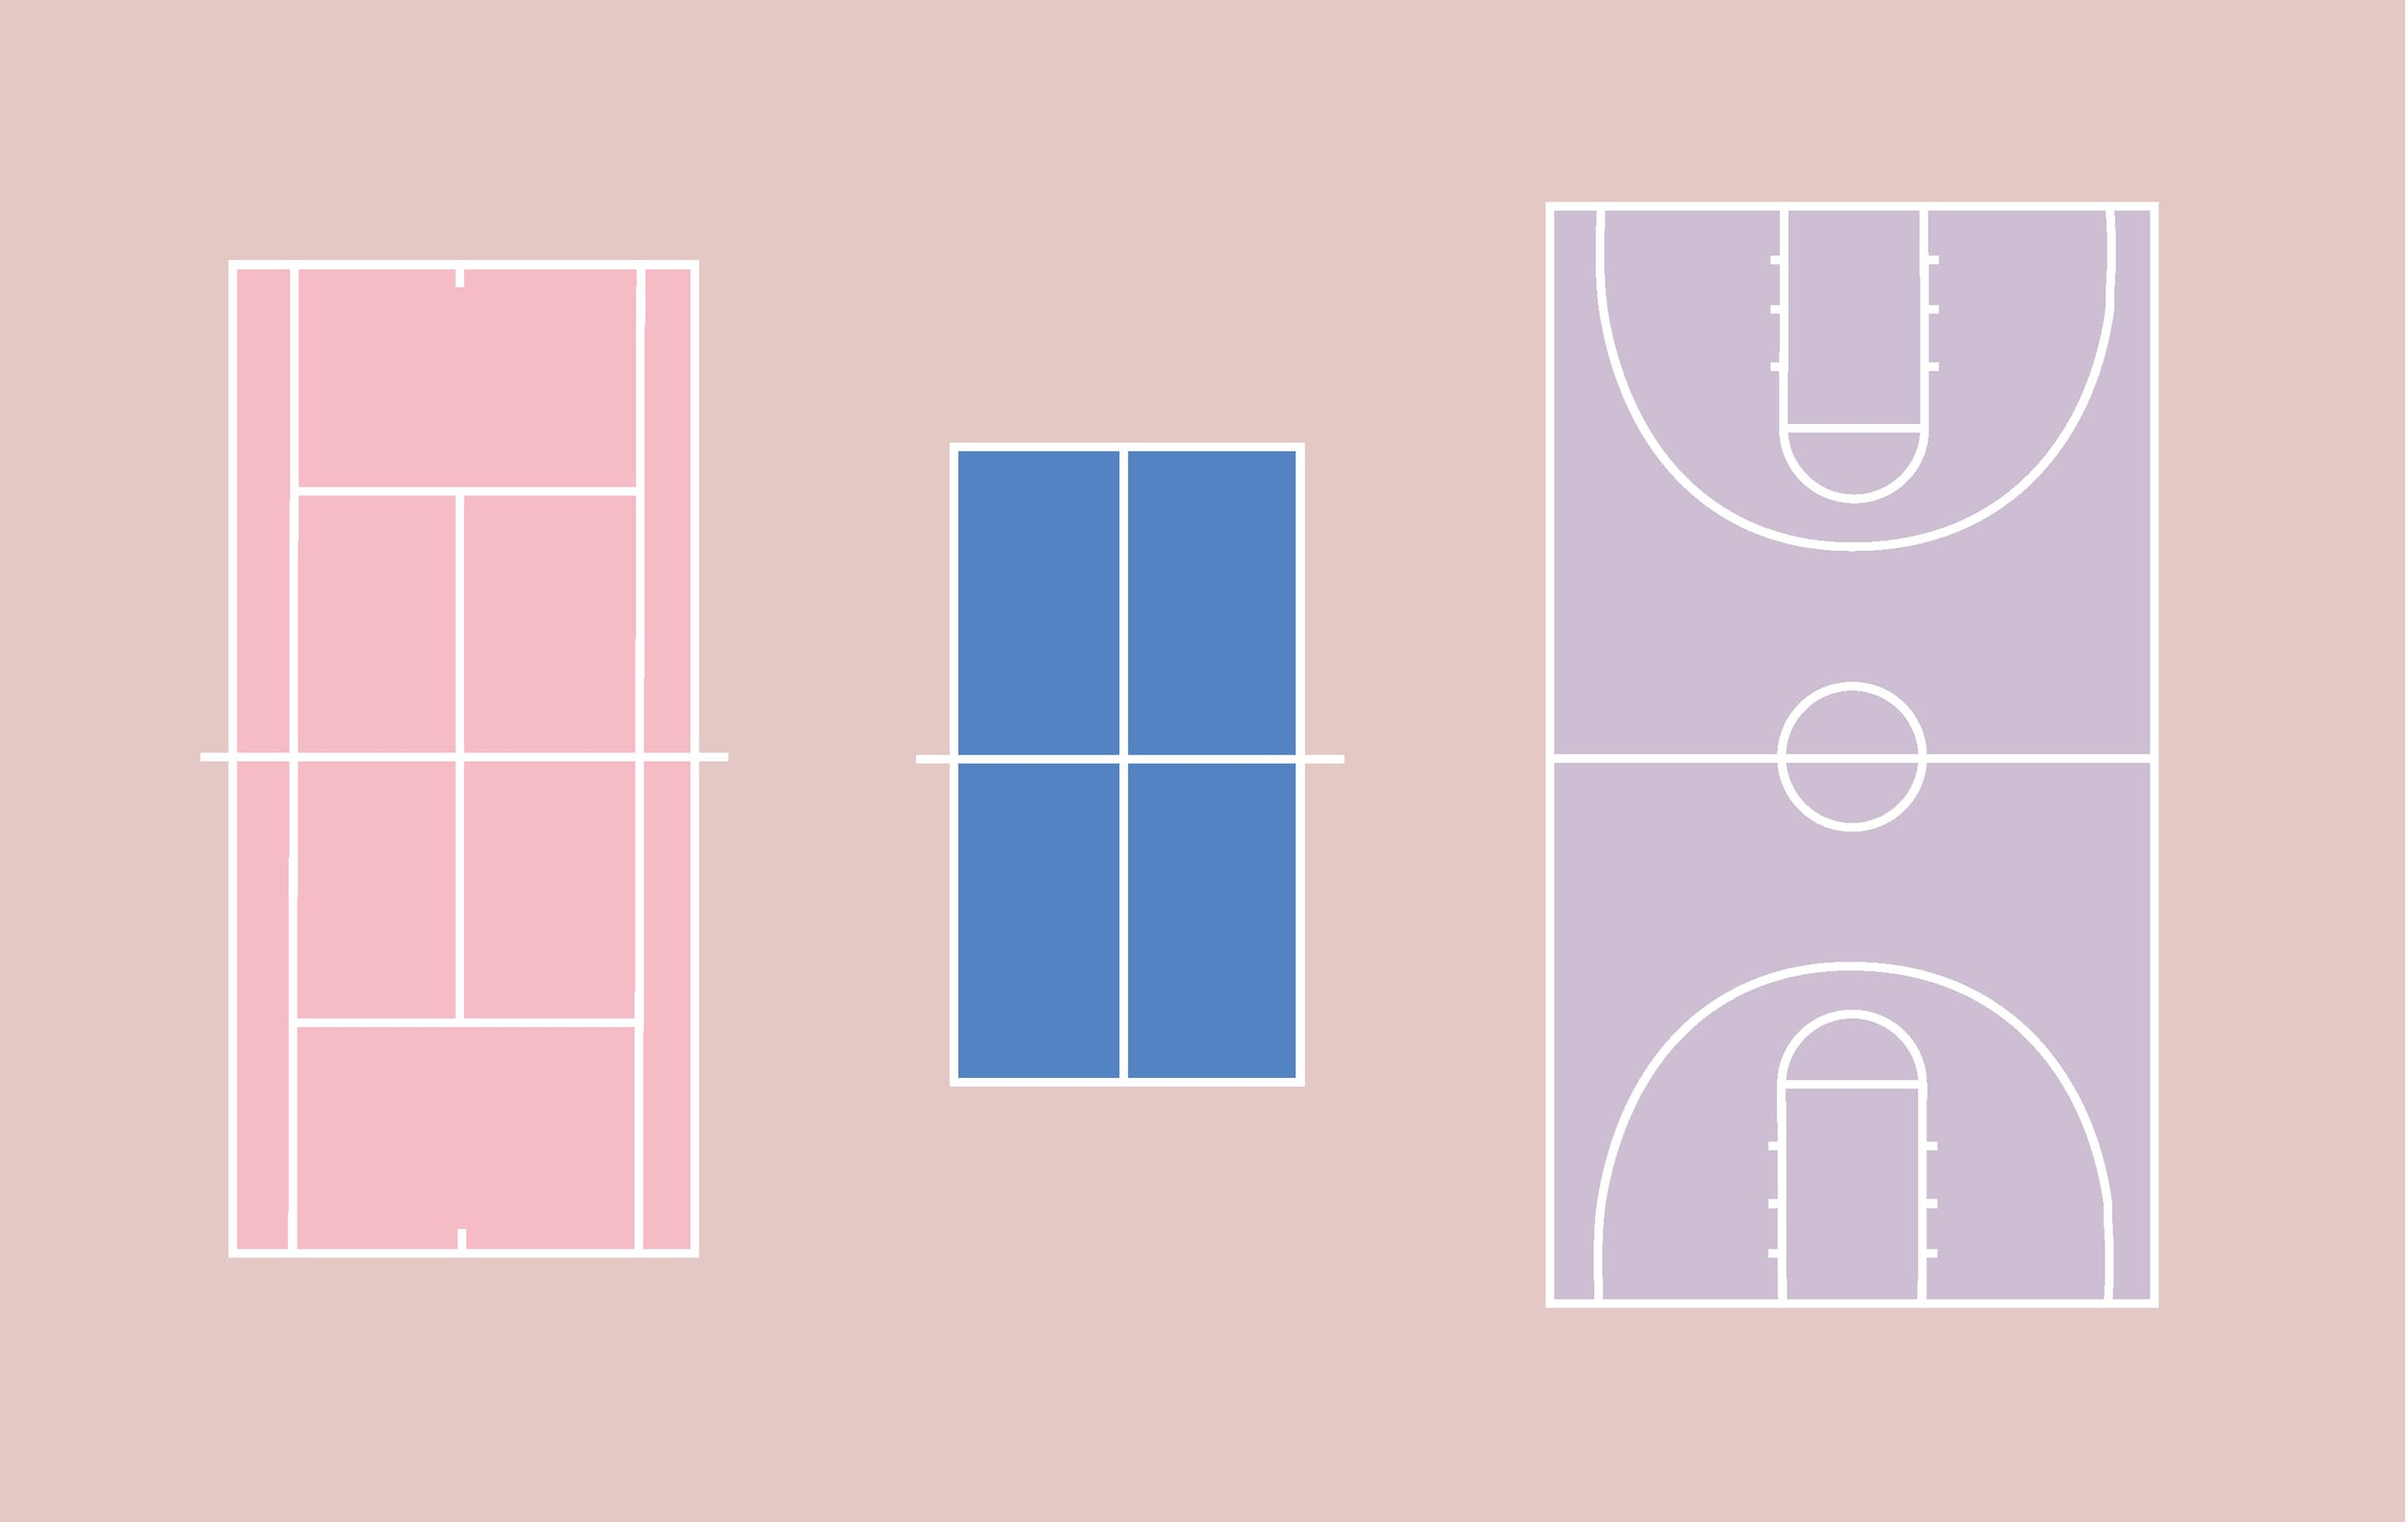 courts_layout.jpg